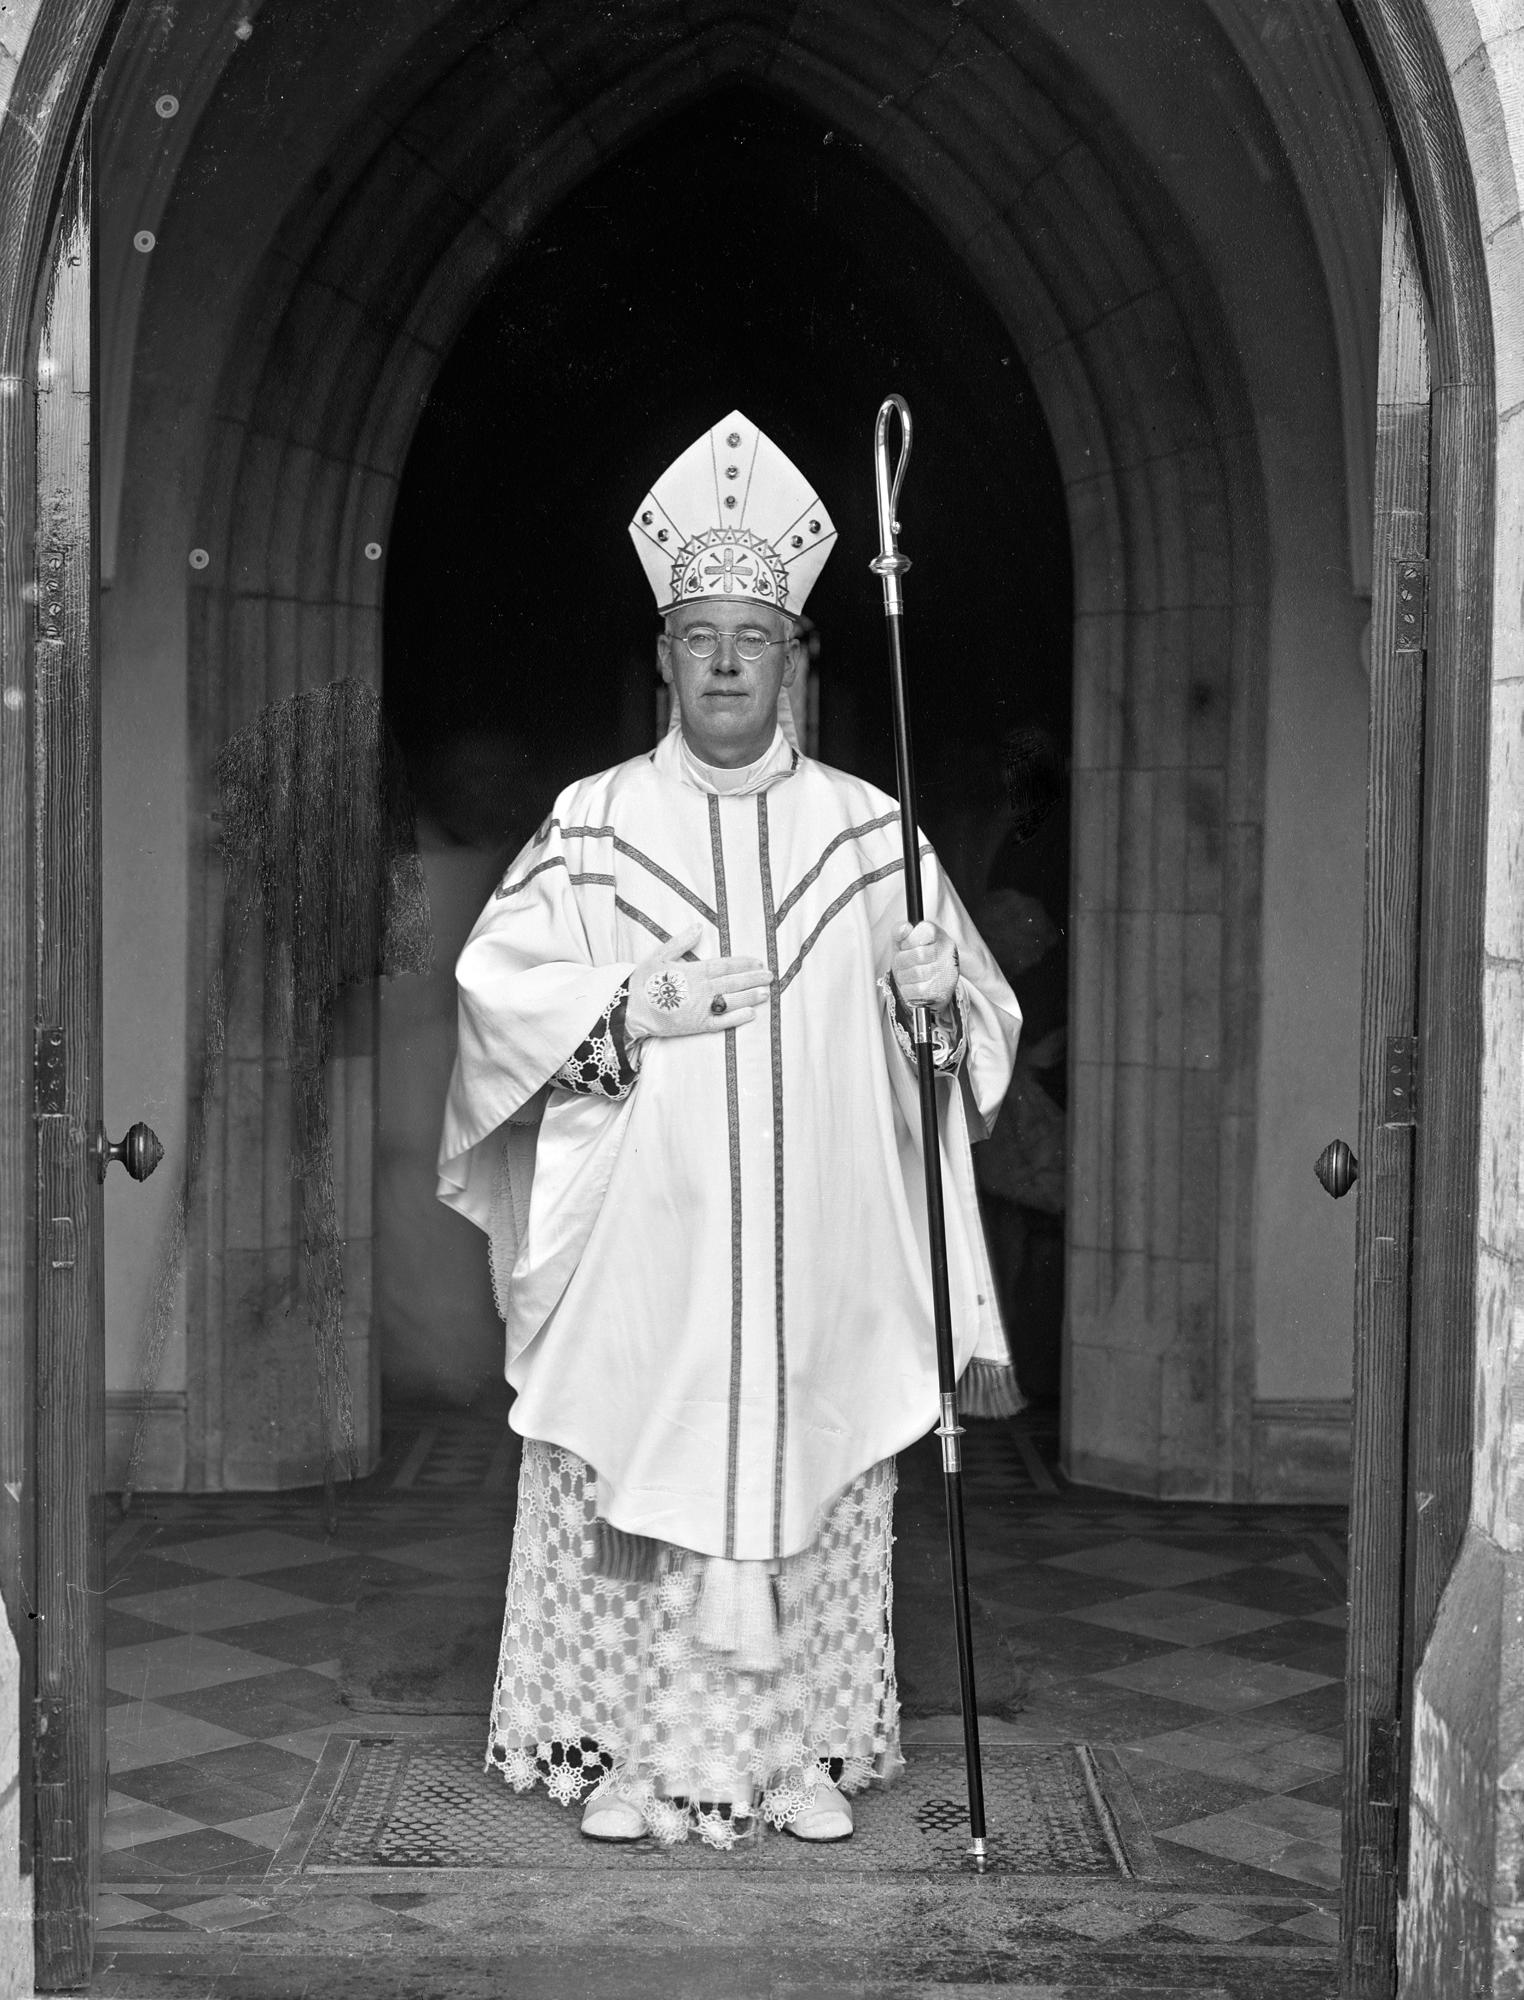 Rev. Cornelius Claffey, at church entrance, full-length portrait